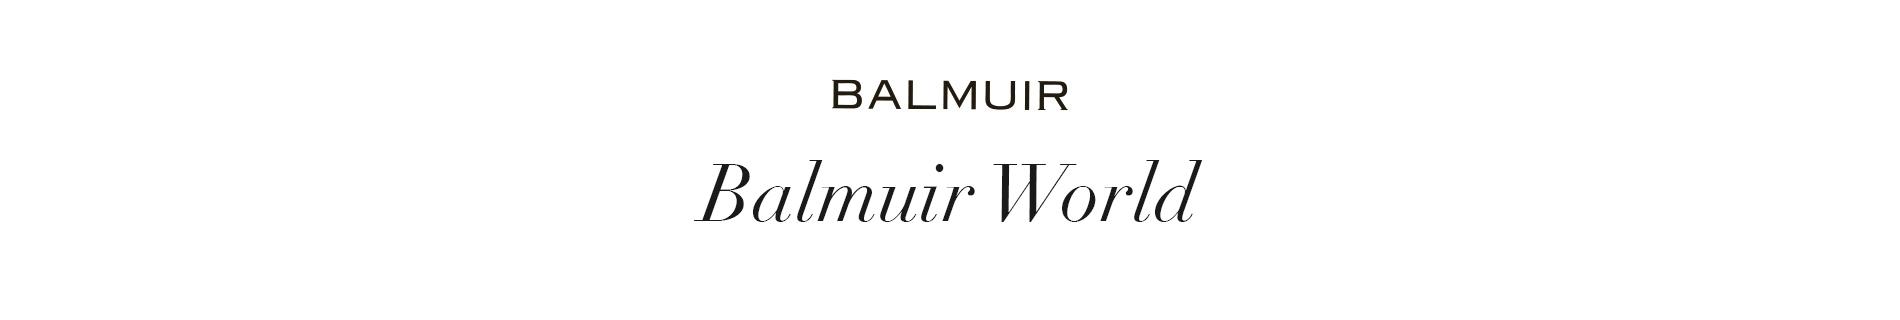 Balmuir World